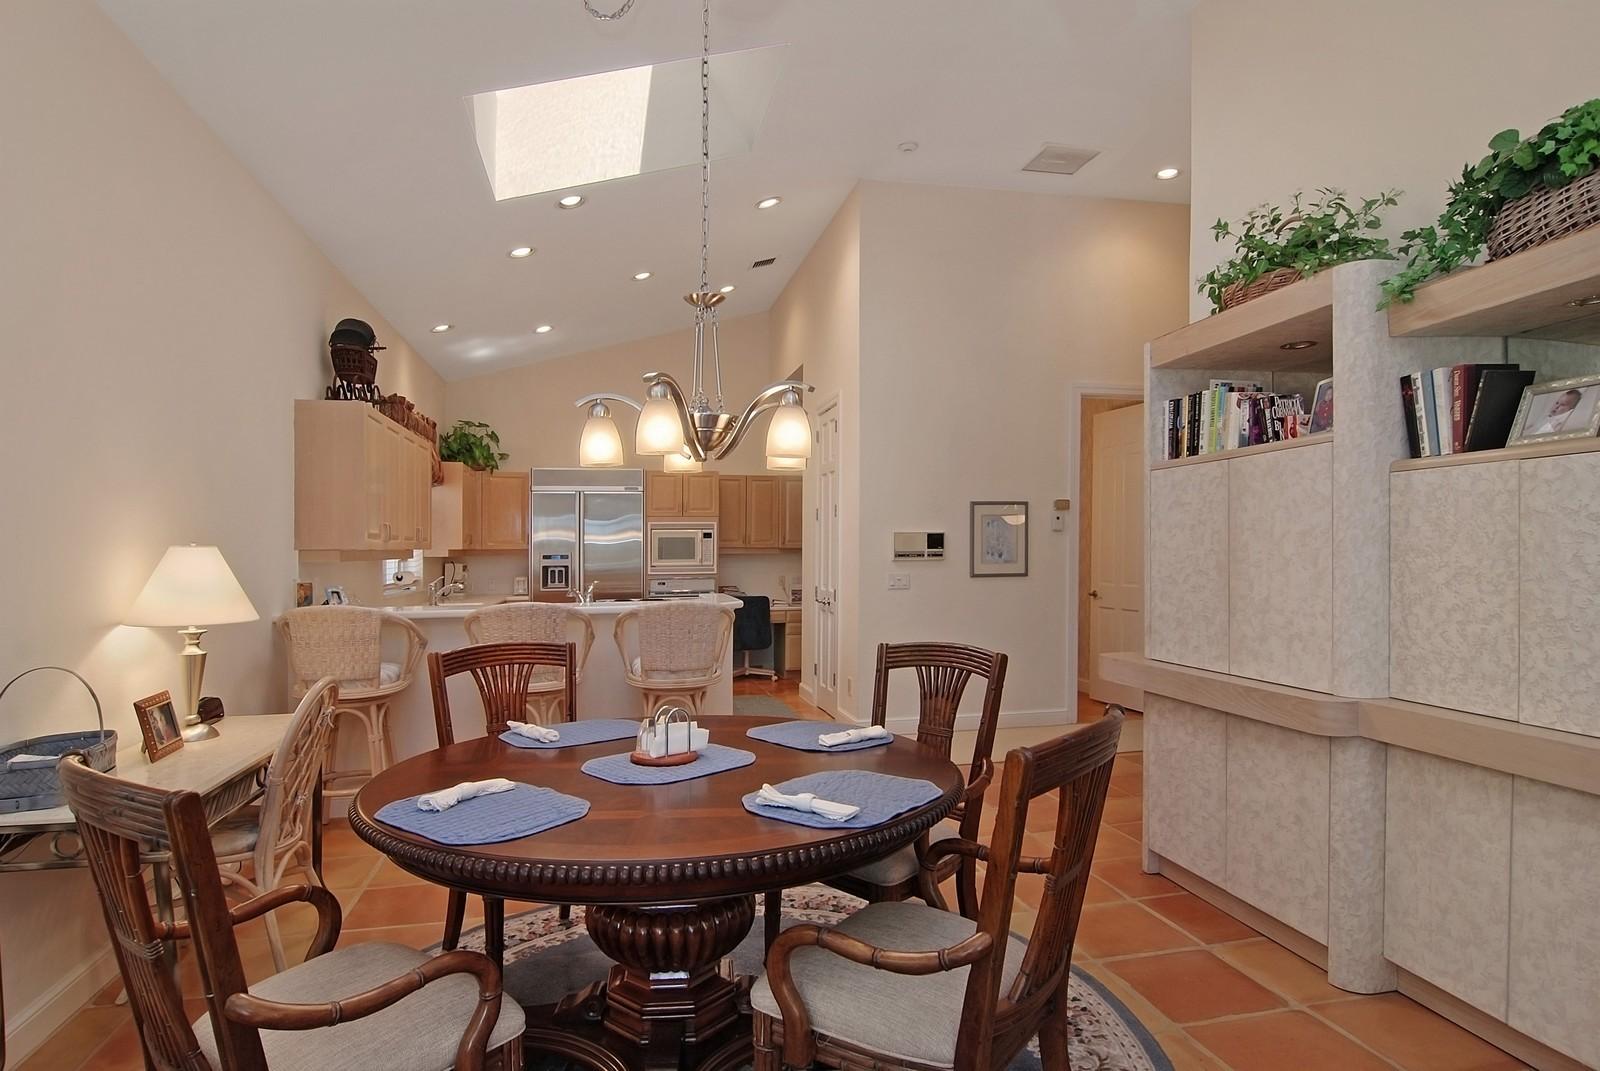 Real Estate Photography - 7000 SE Lakeview, Stuart, FL, 34996 - Breakfast Nook